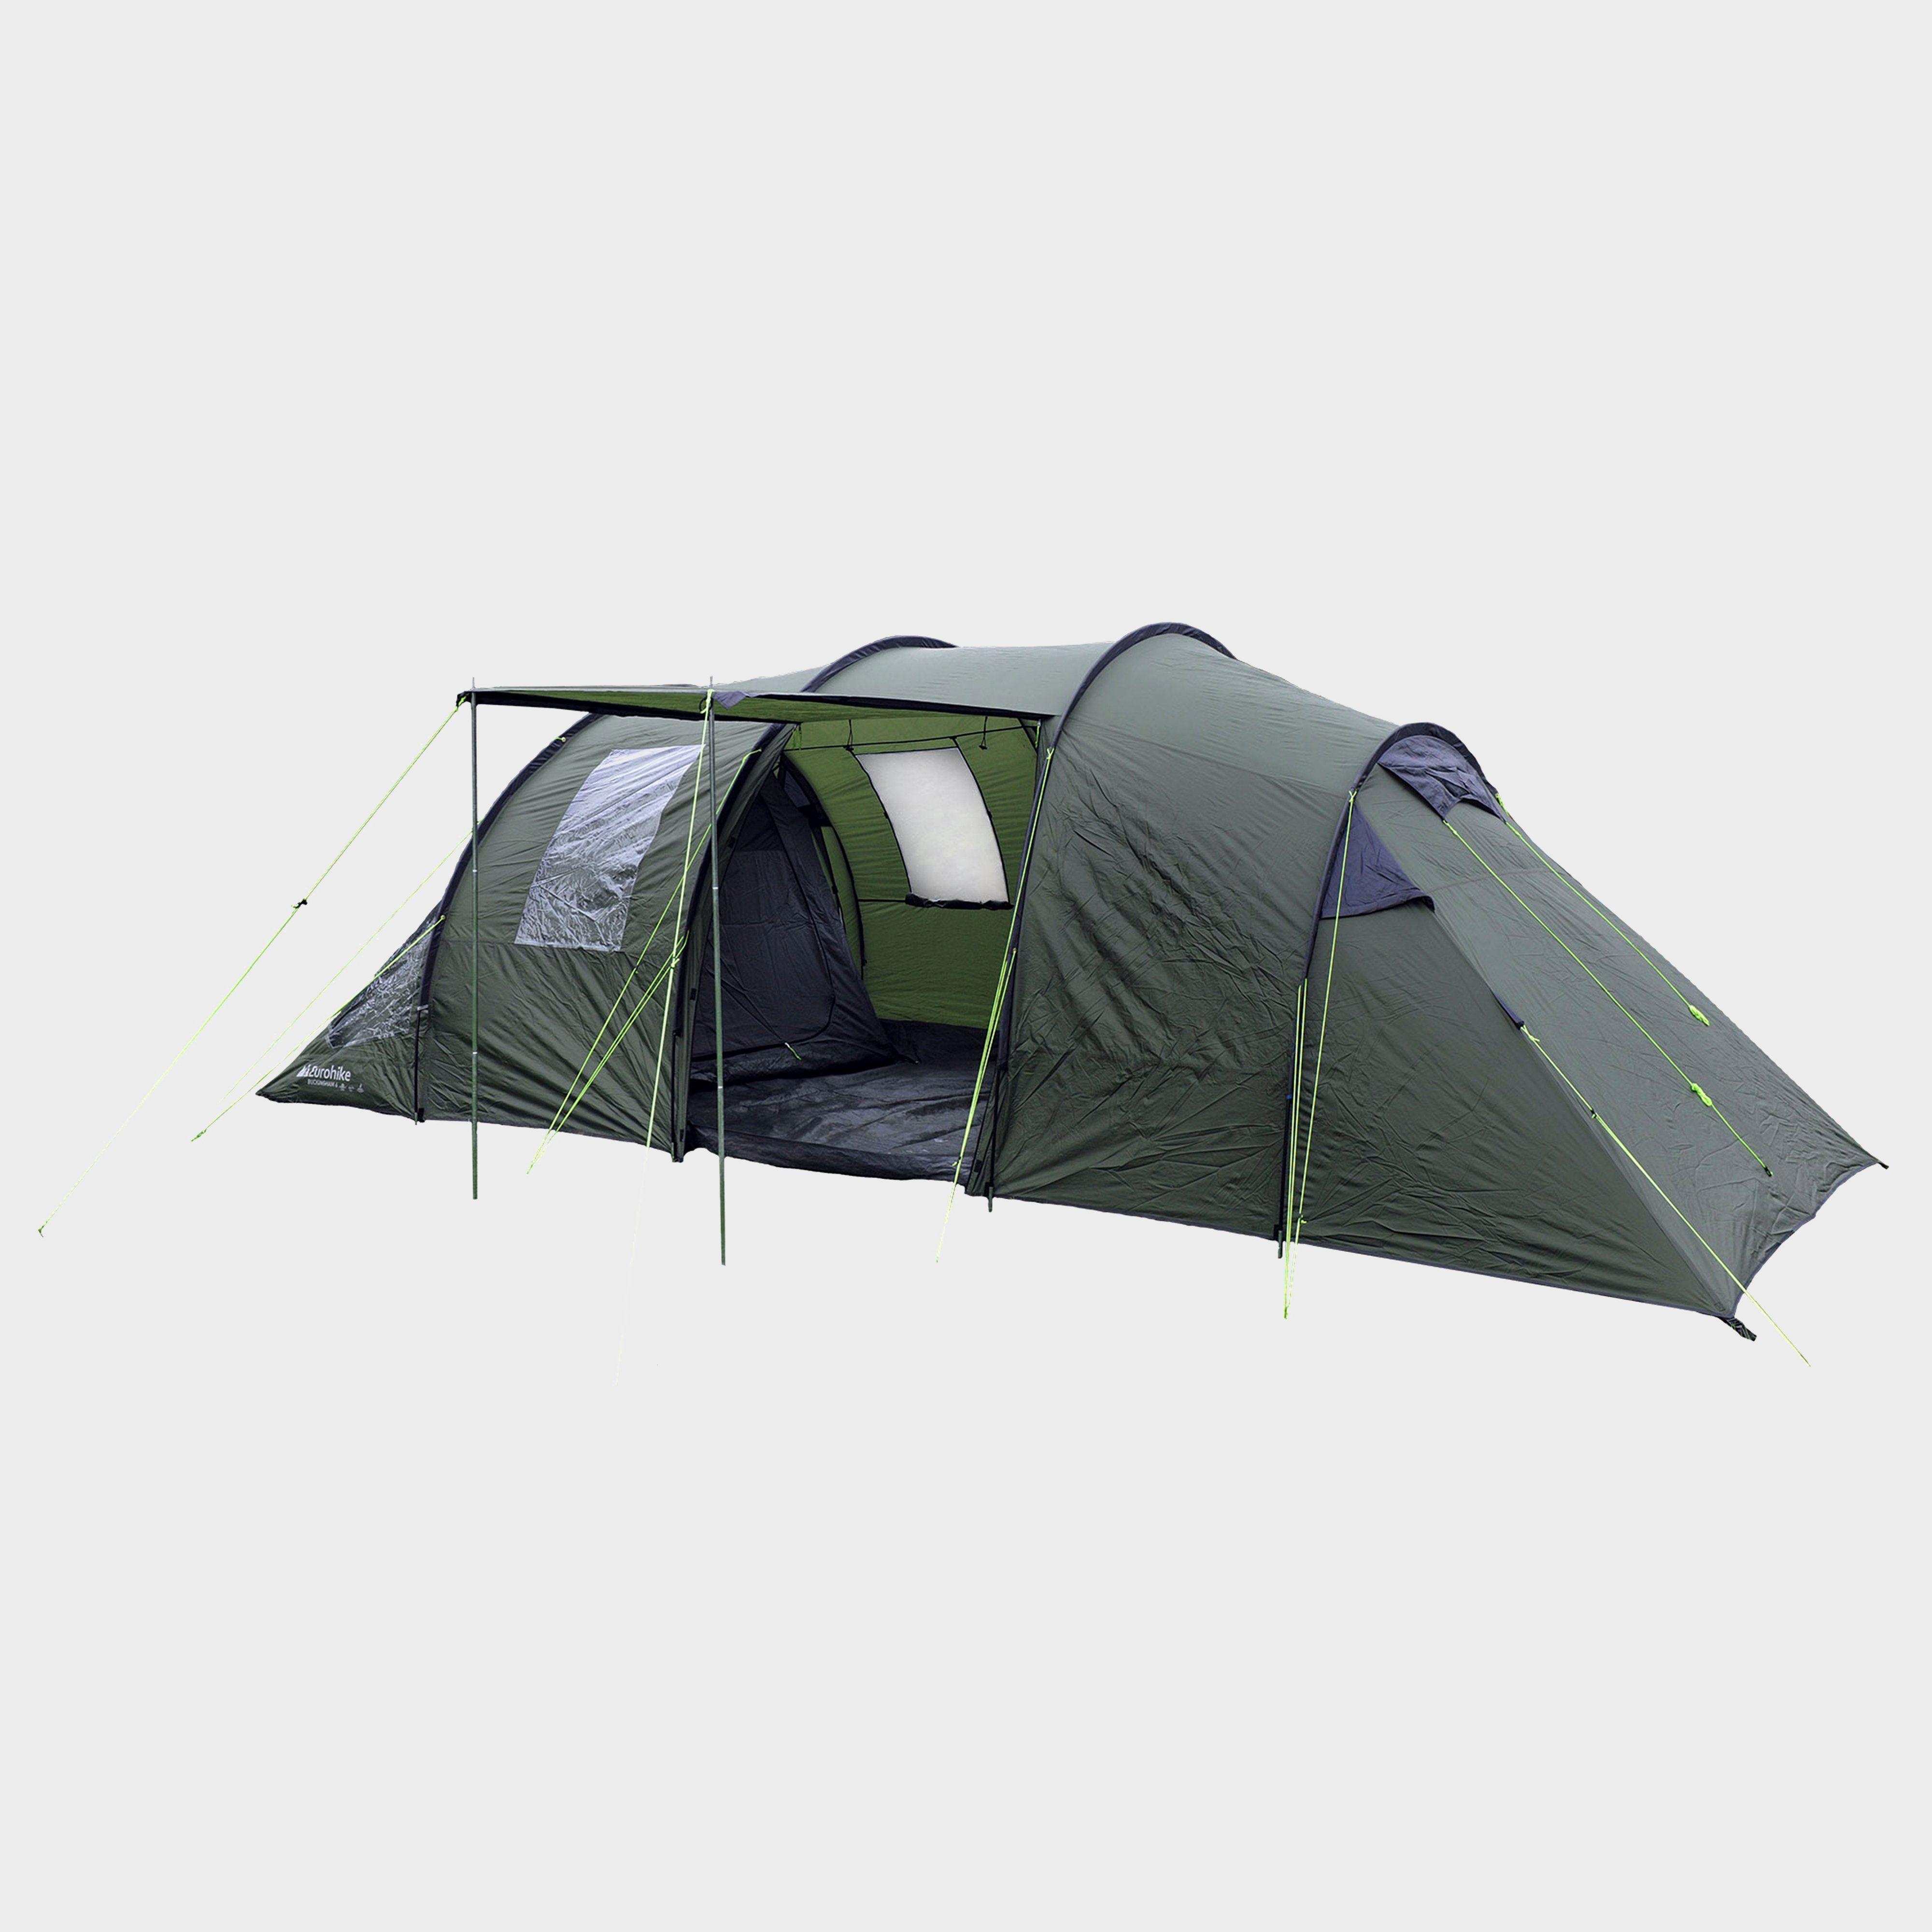 EUROHIKE Buckingham 6 Classic Man Tent